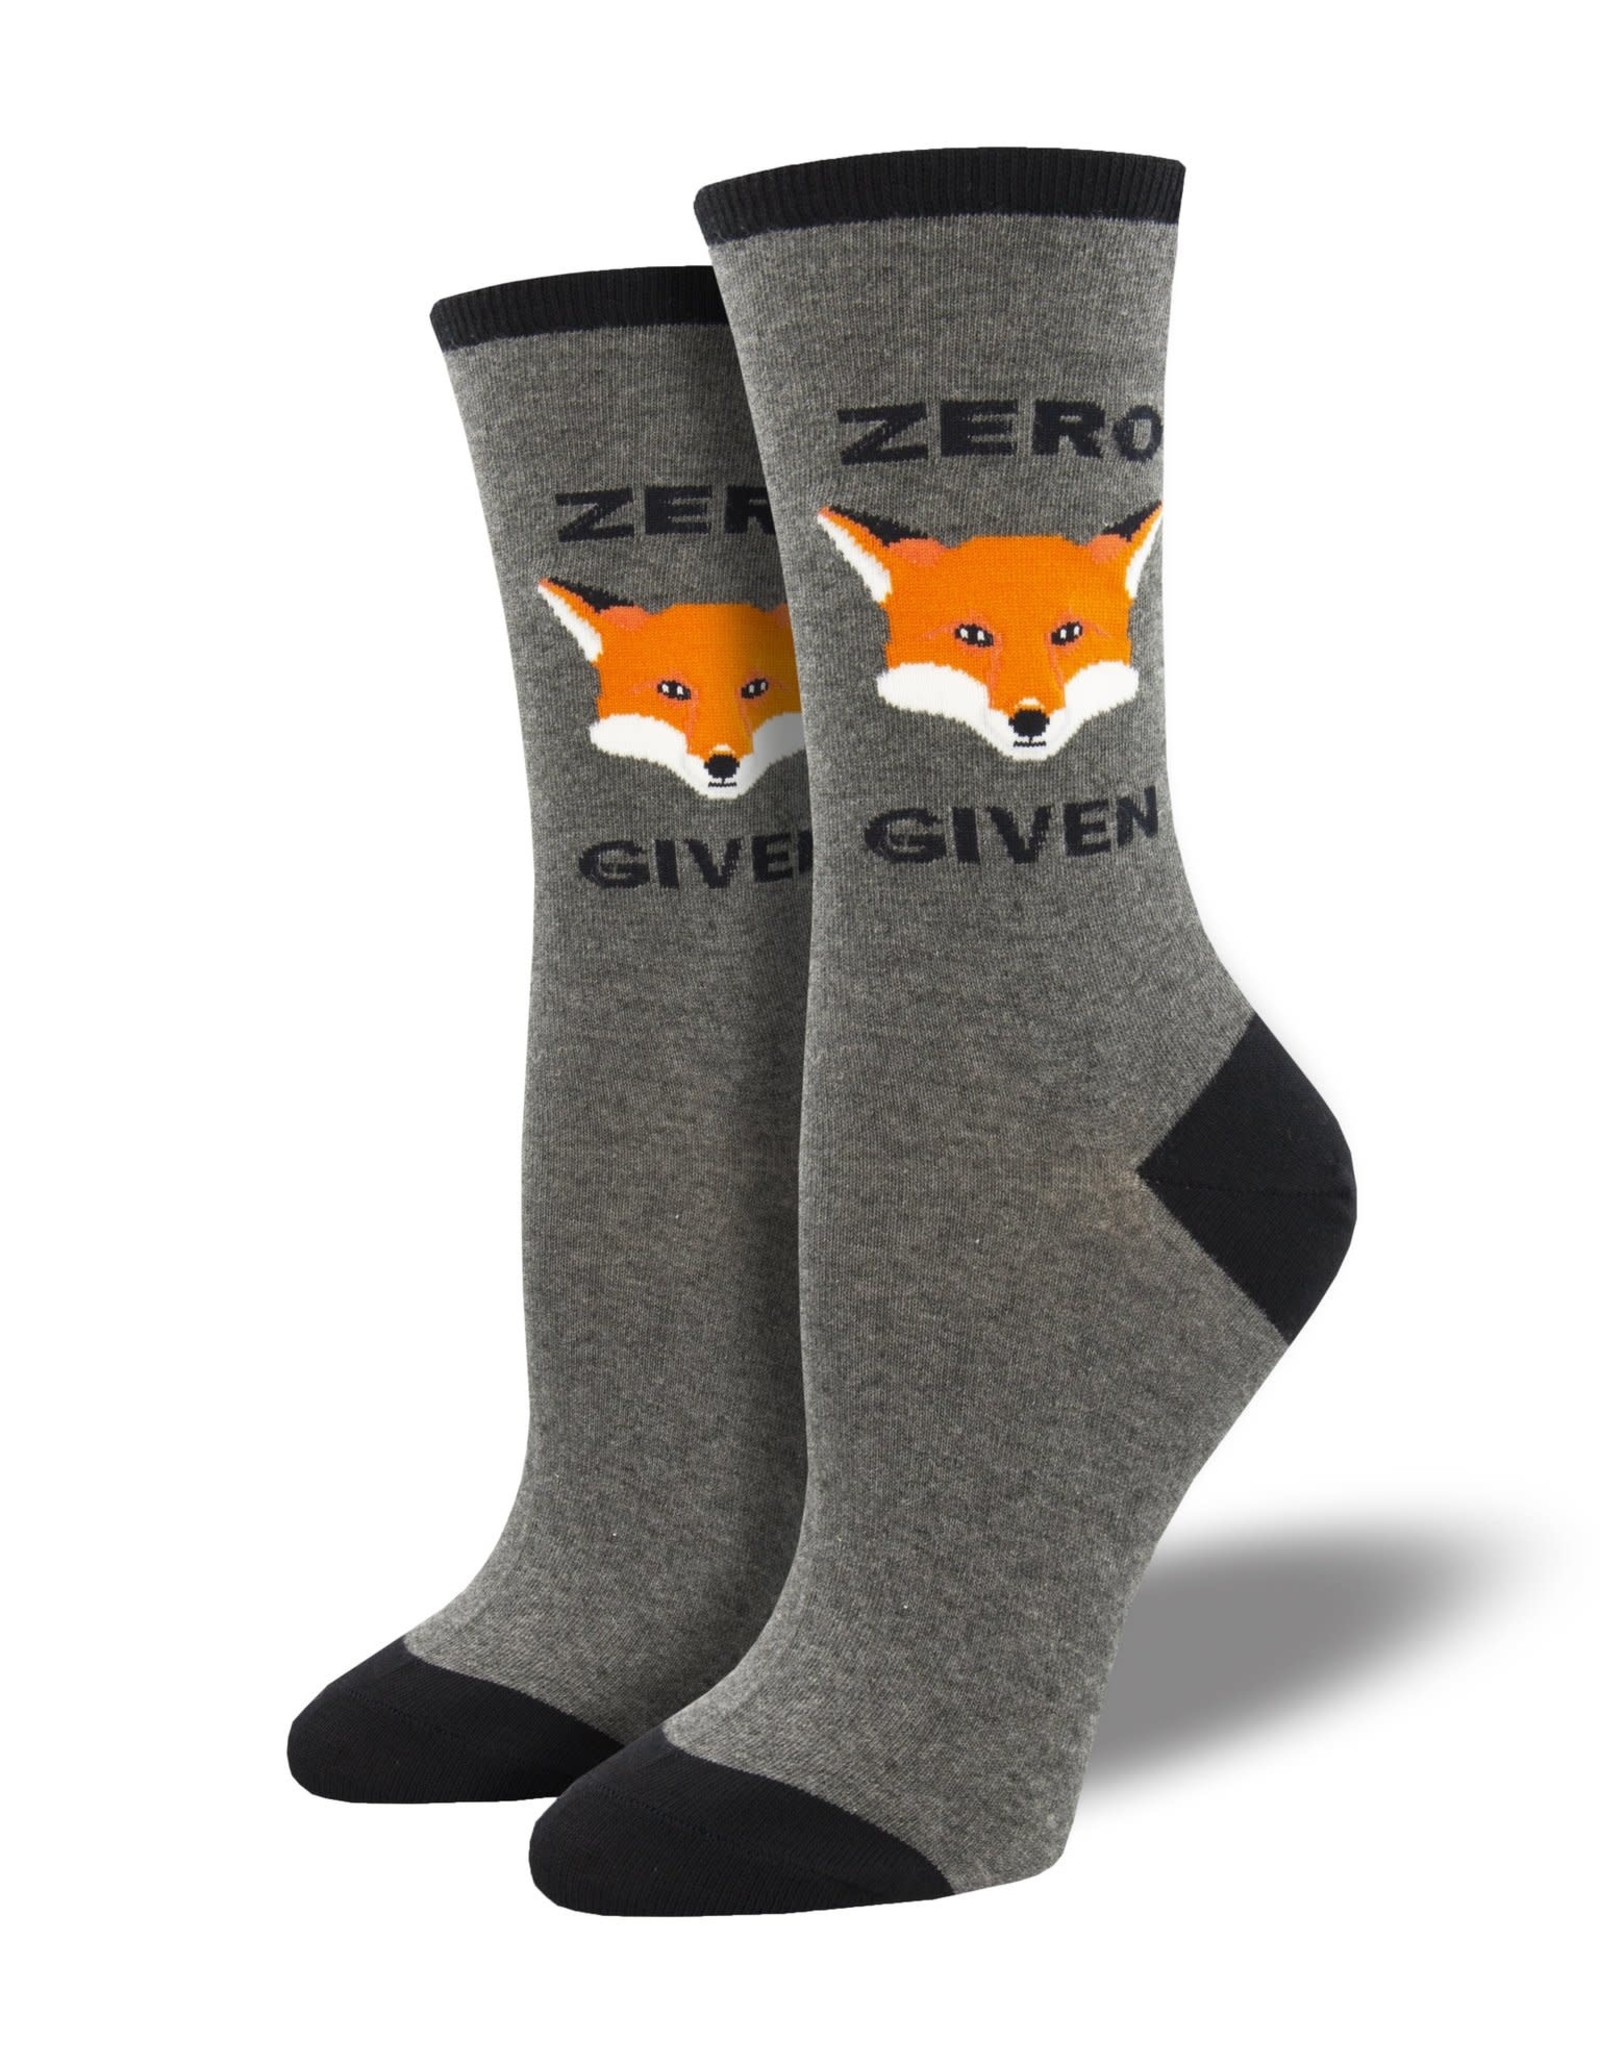 Socks (Womens) - Zero Fox Given